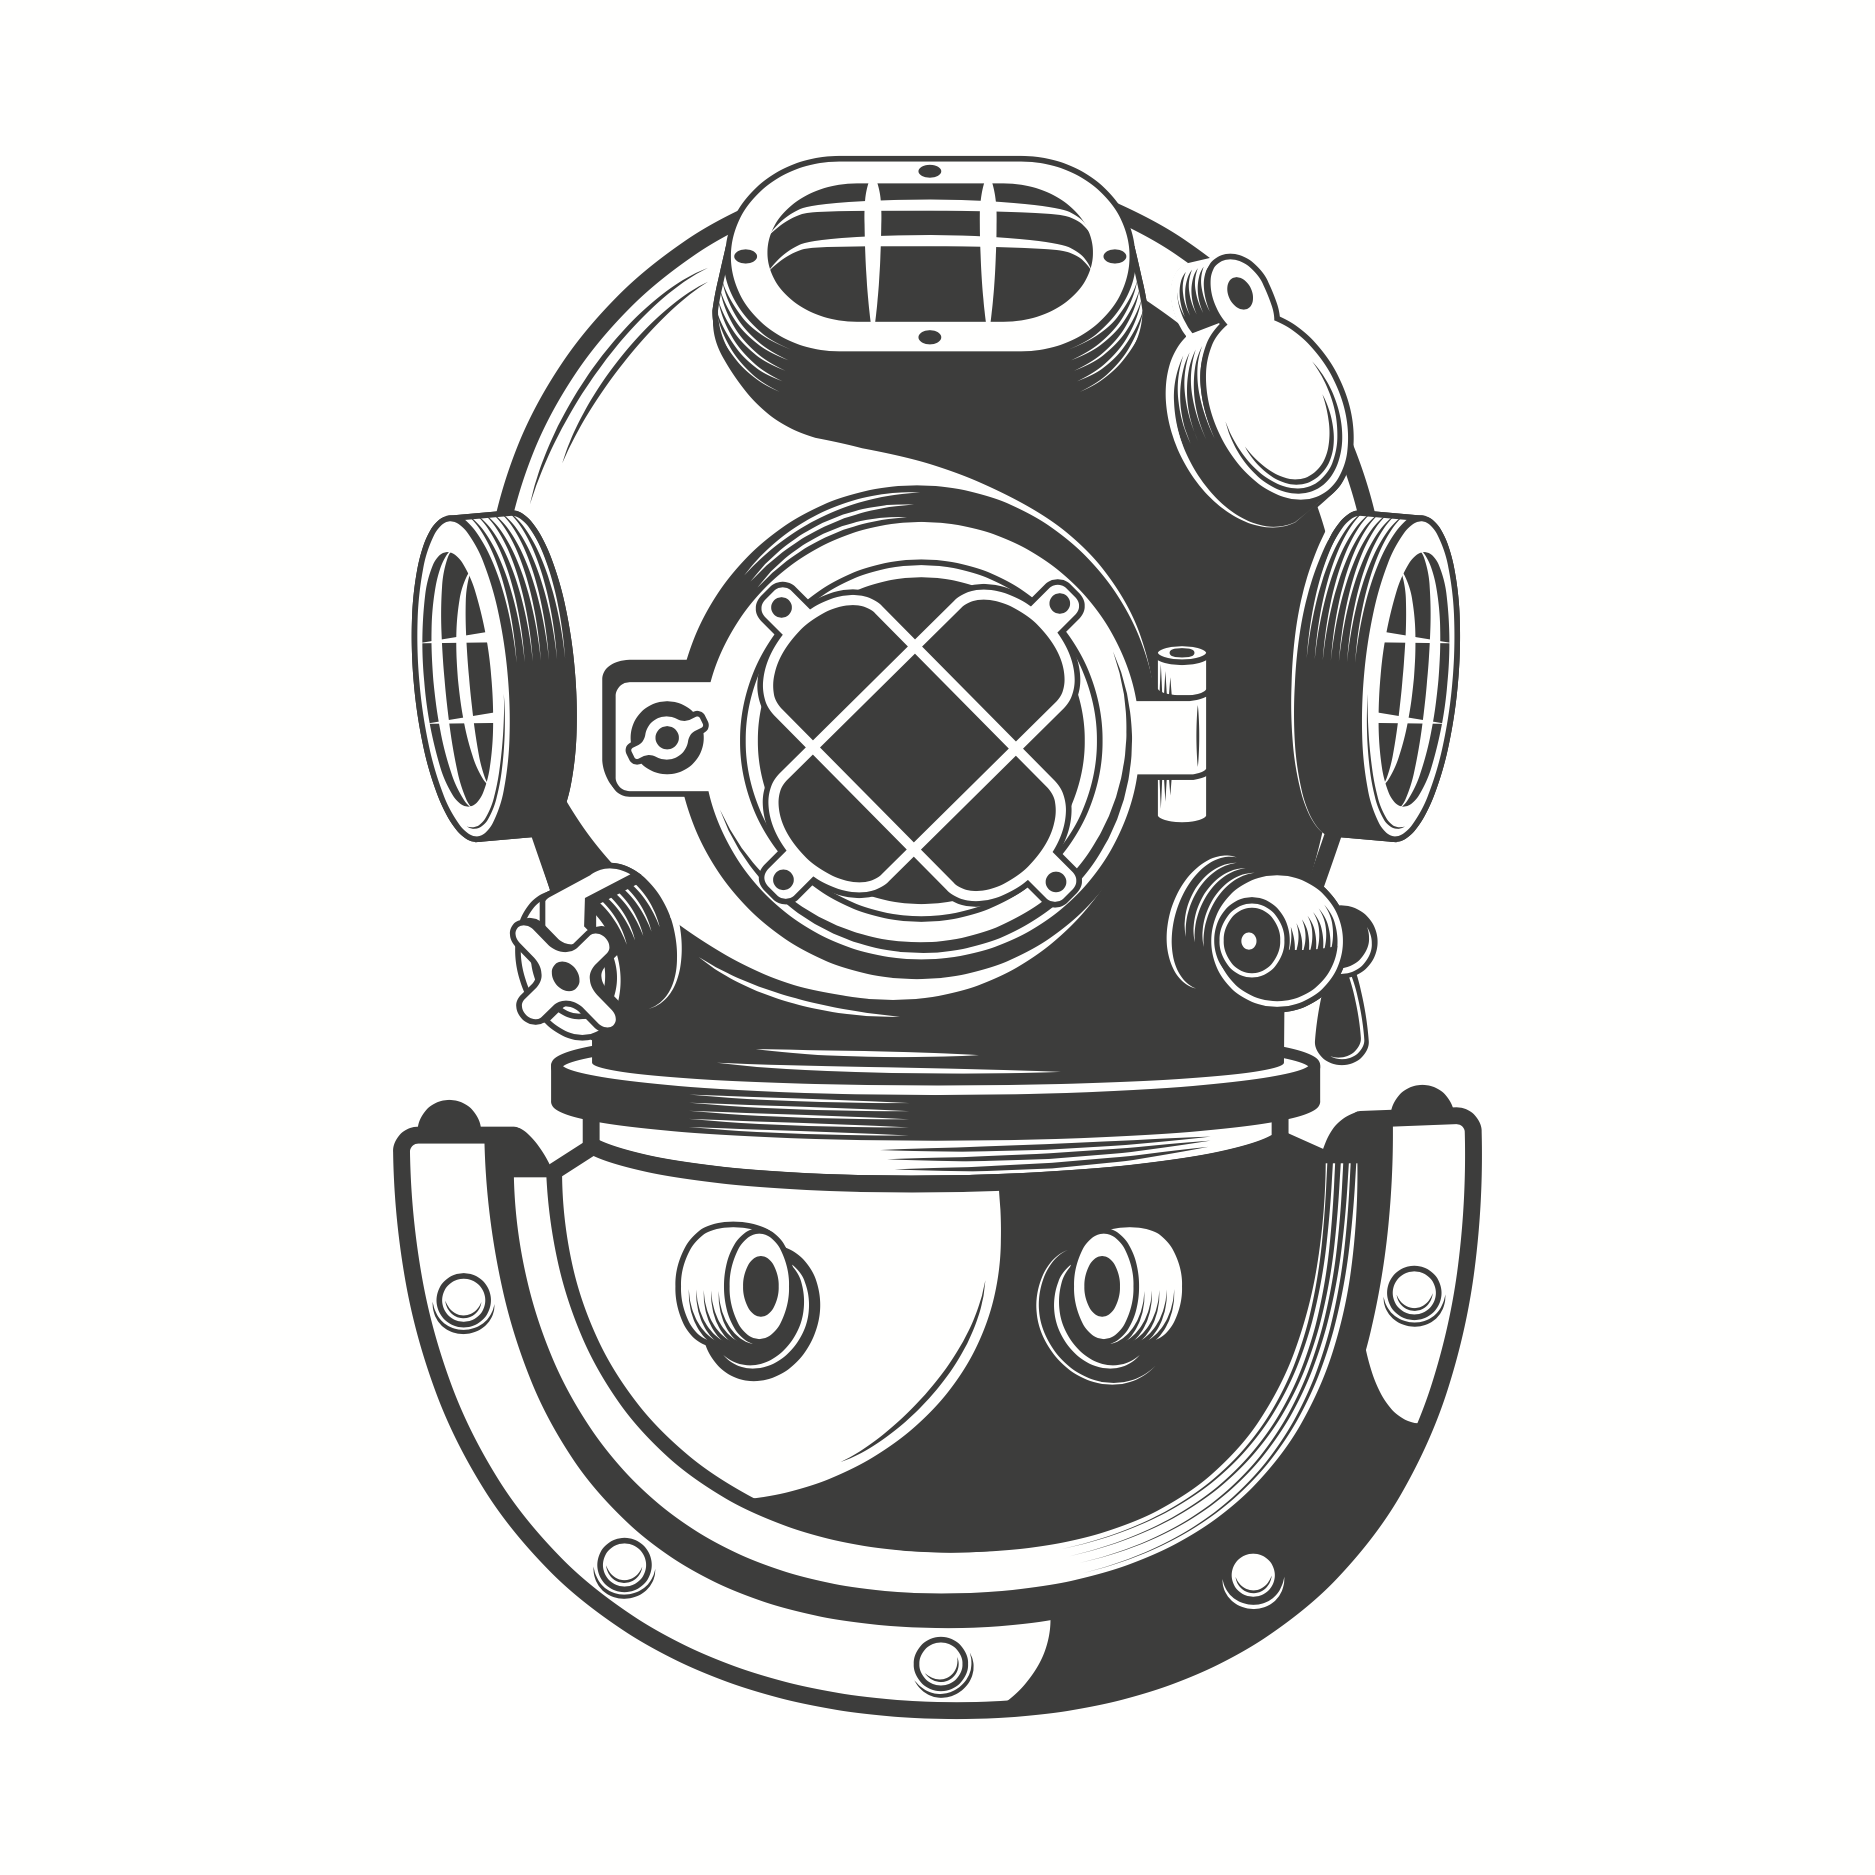 Pin By D B Patterson On Epiphany Man Diving Helmet Scuba Tattoo Helmet Drawing